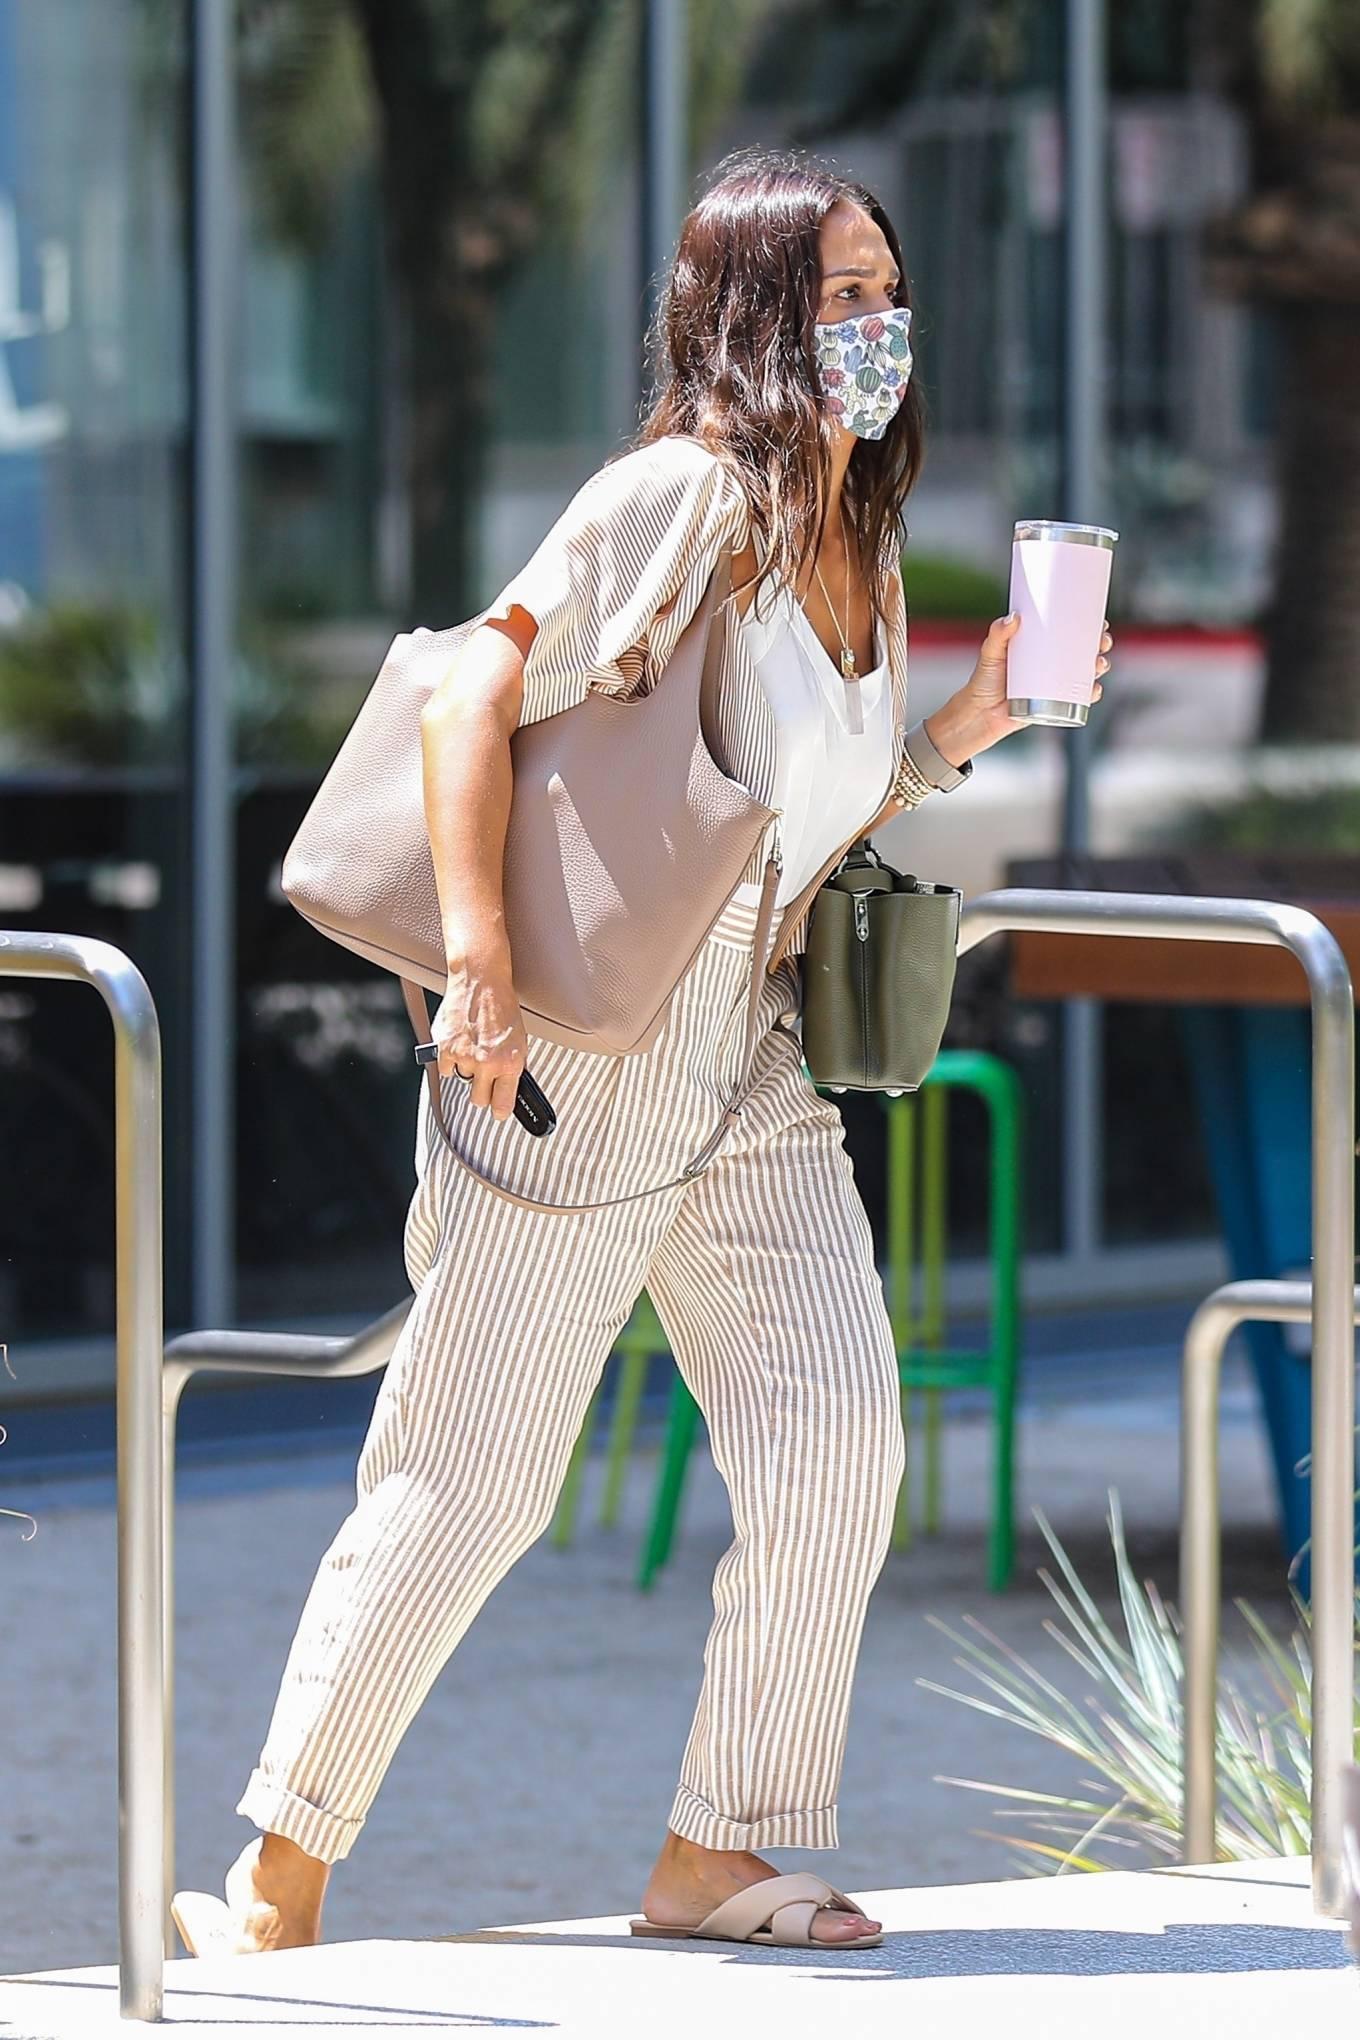 Jessica Alba - Seen at Starbucks for drinks Playa Vista